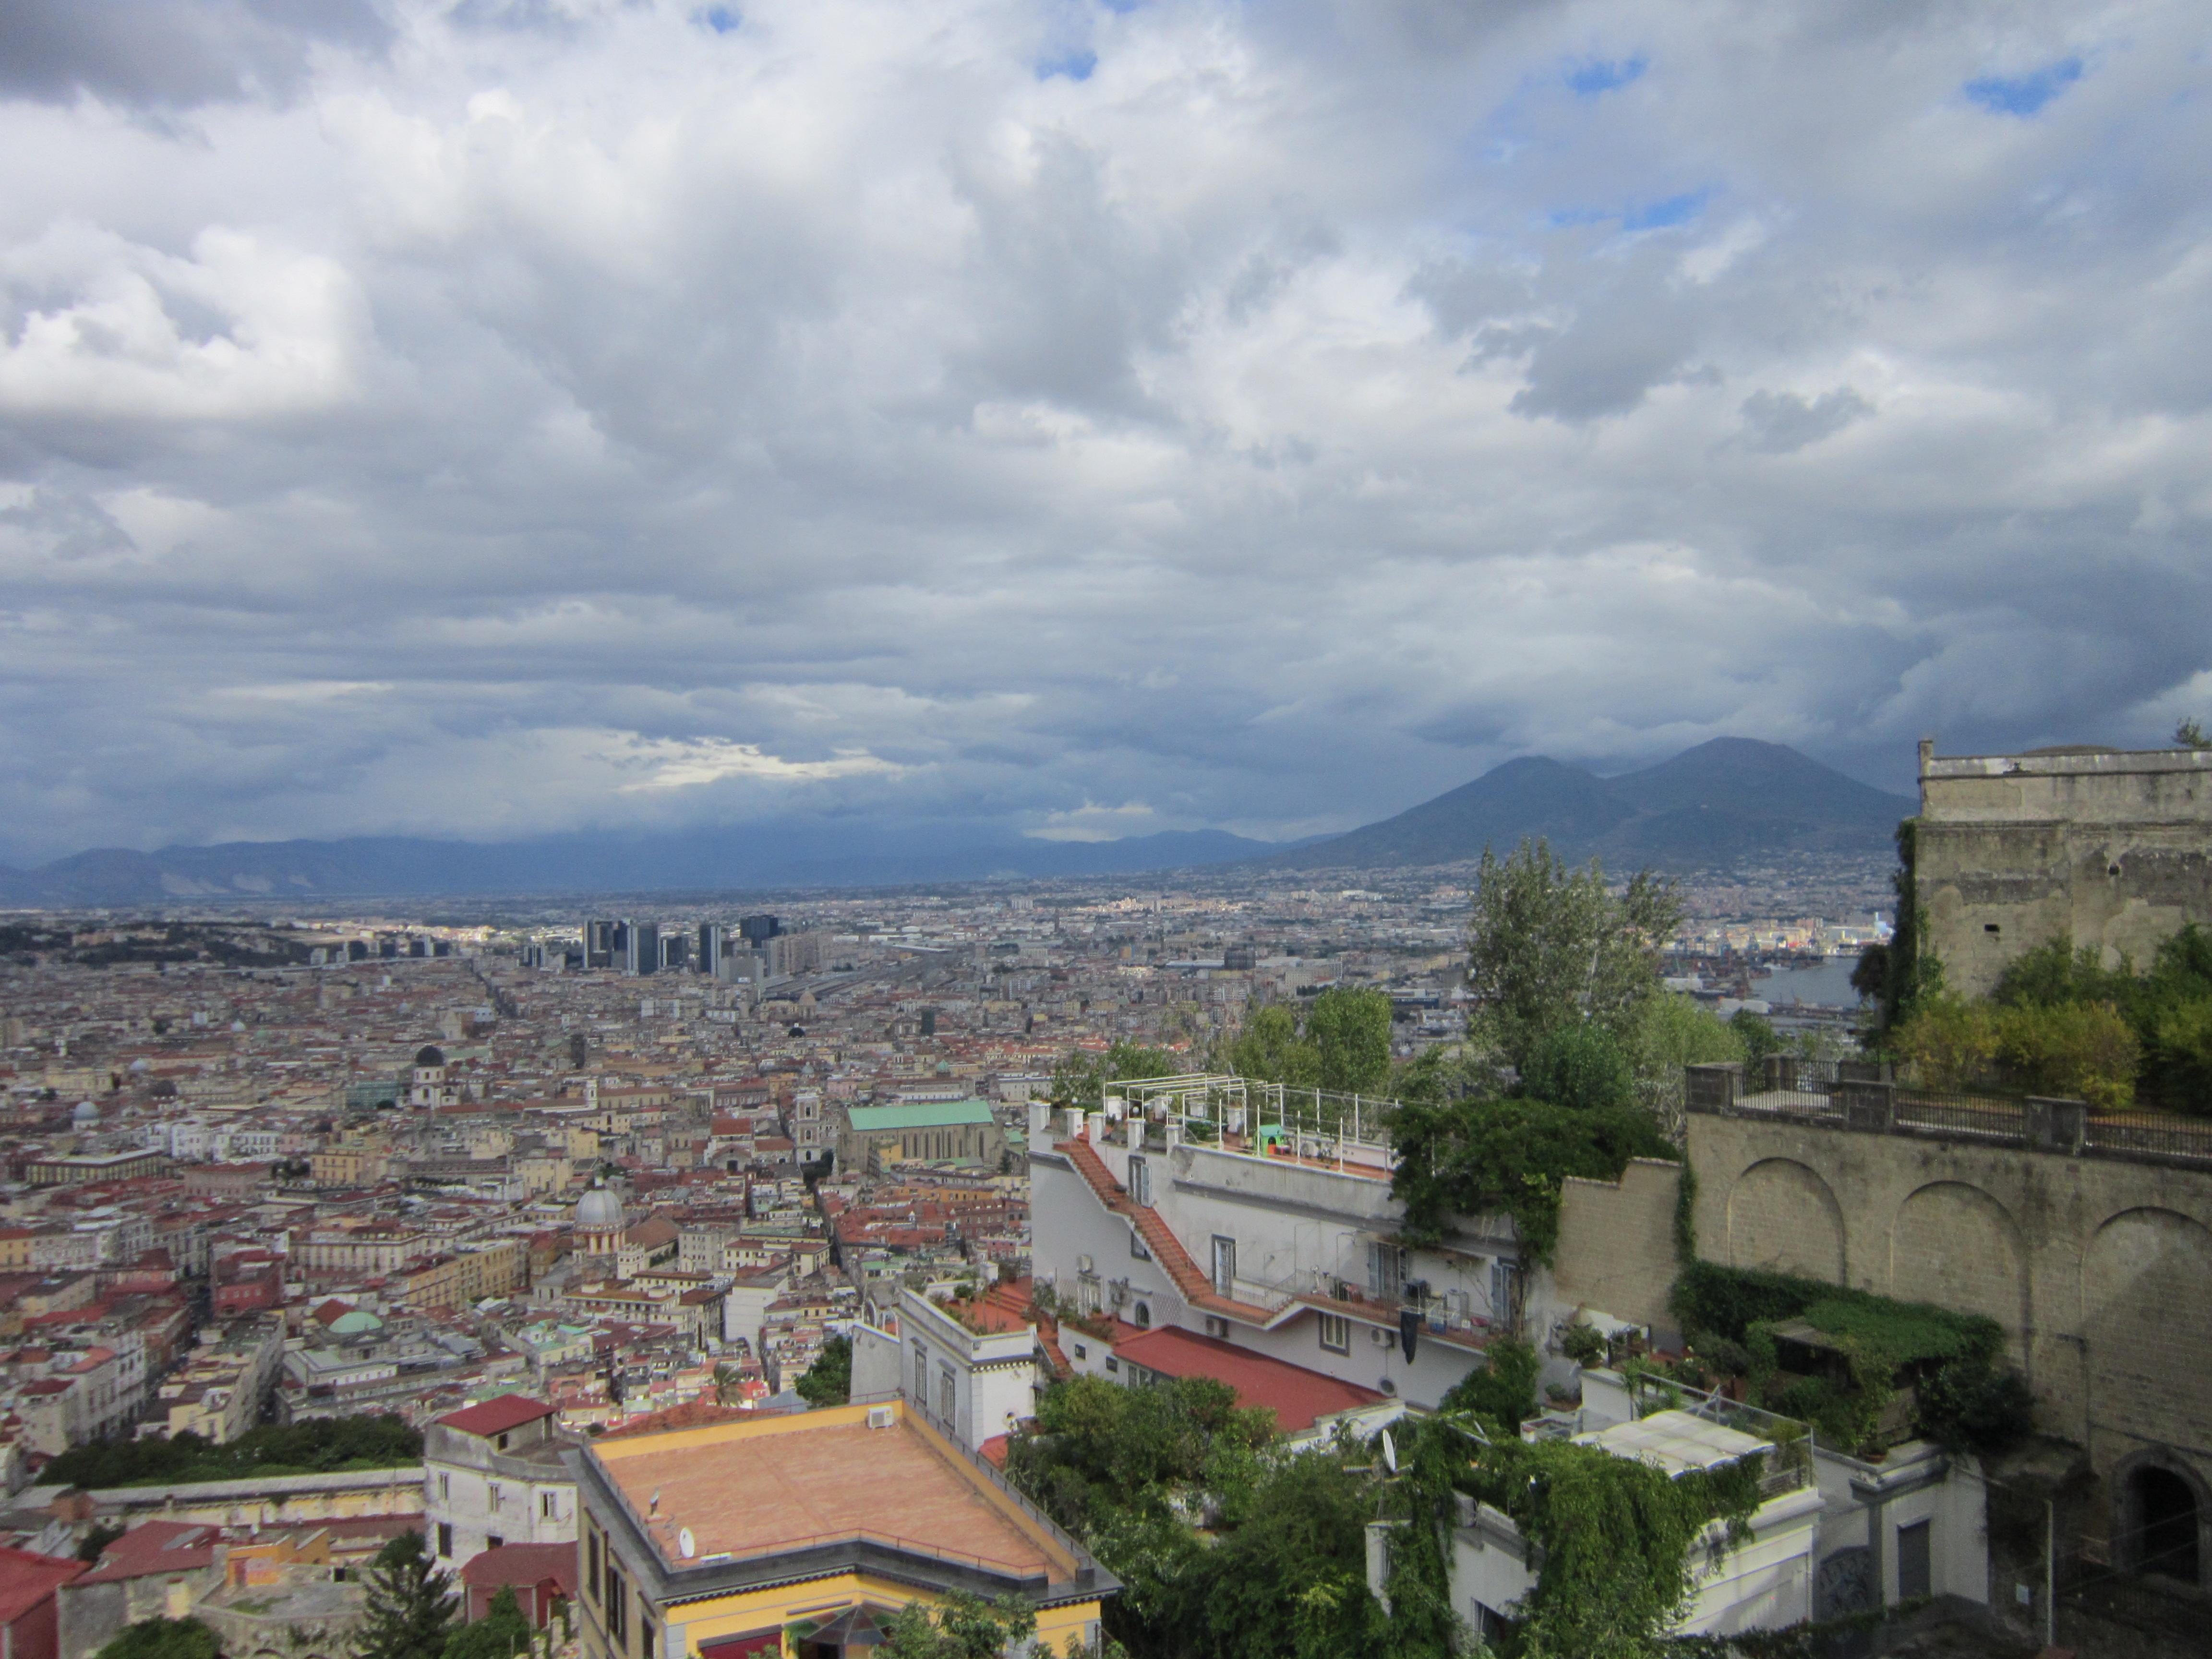 Napoli with Mount Vesuvius in the background